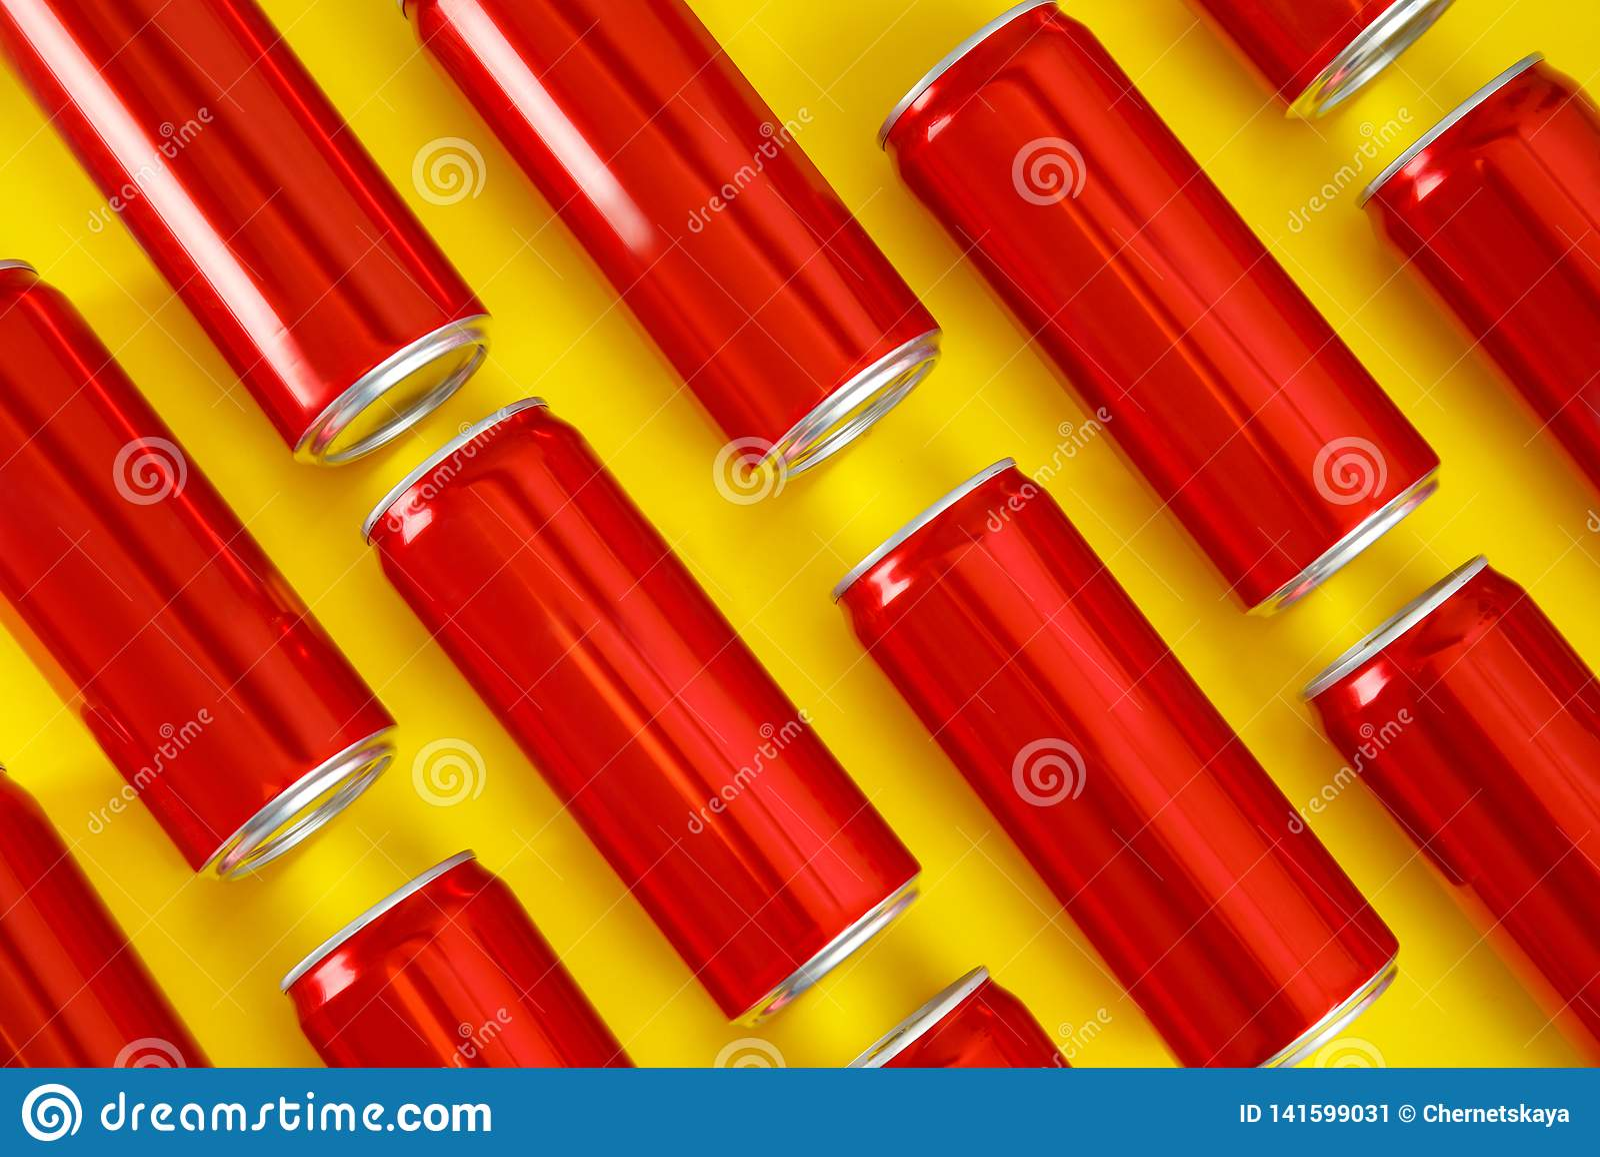 MYKOLAIV, ΟΥΚΡΑΝΙΑ - 14 ΝΟΕΜΒΡΊΟΥ 2018: Δοχεία της Coca-Cola στο υπόβαθρο χρώματος